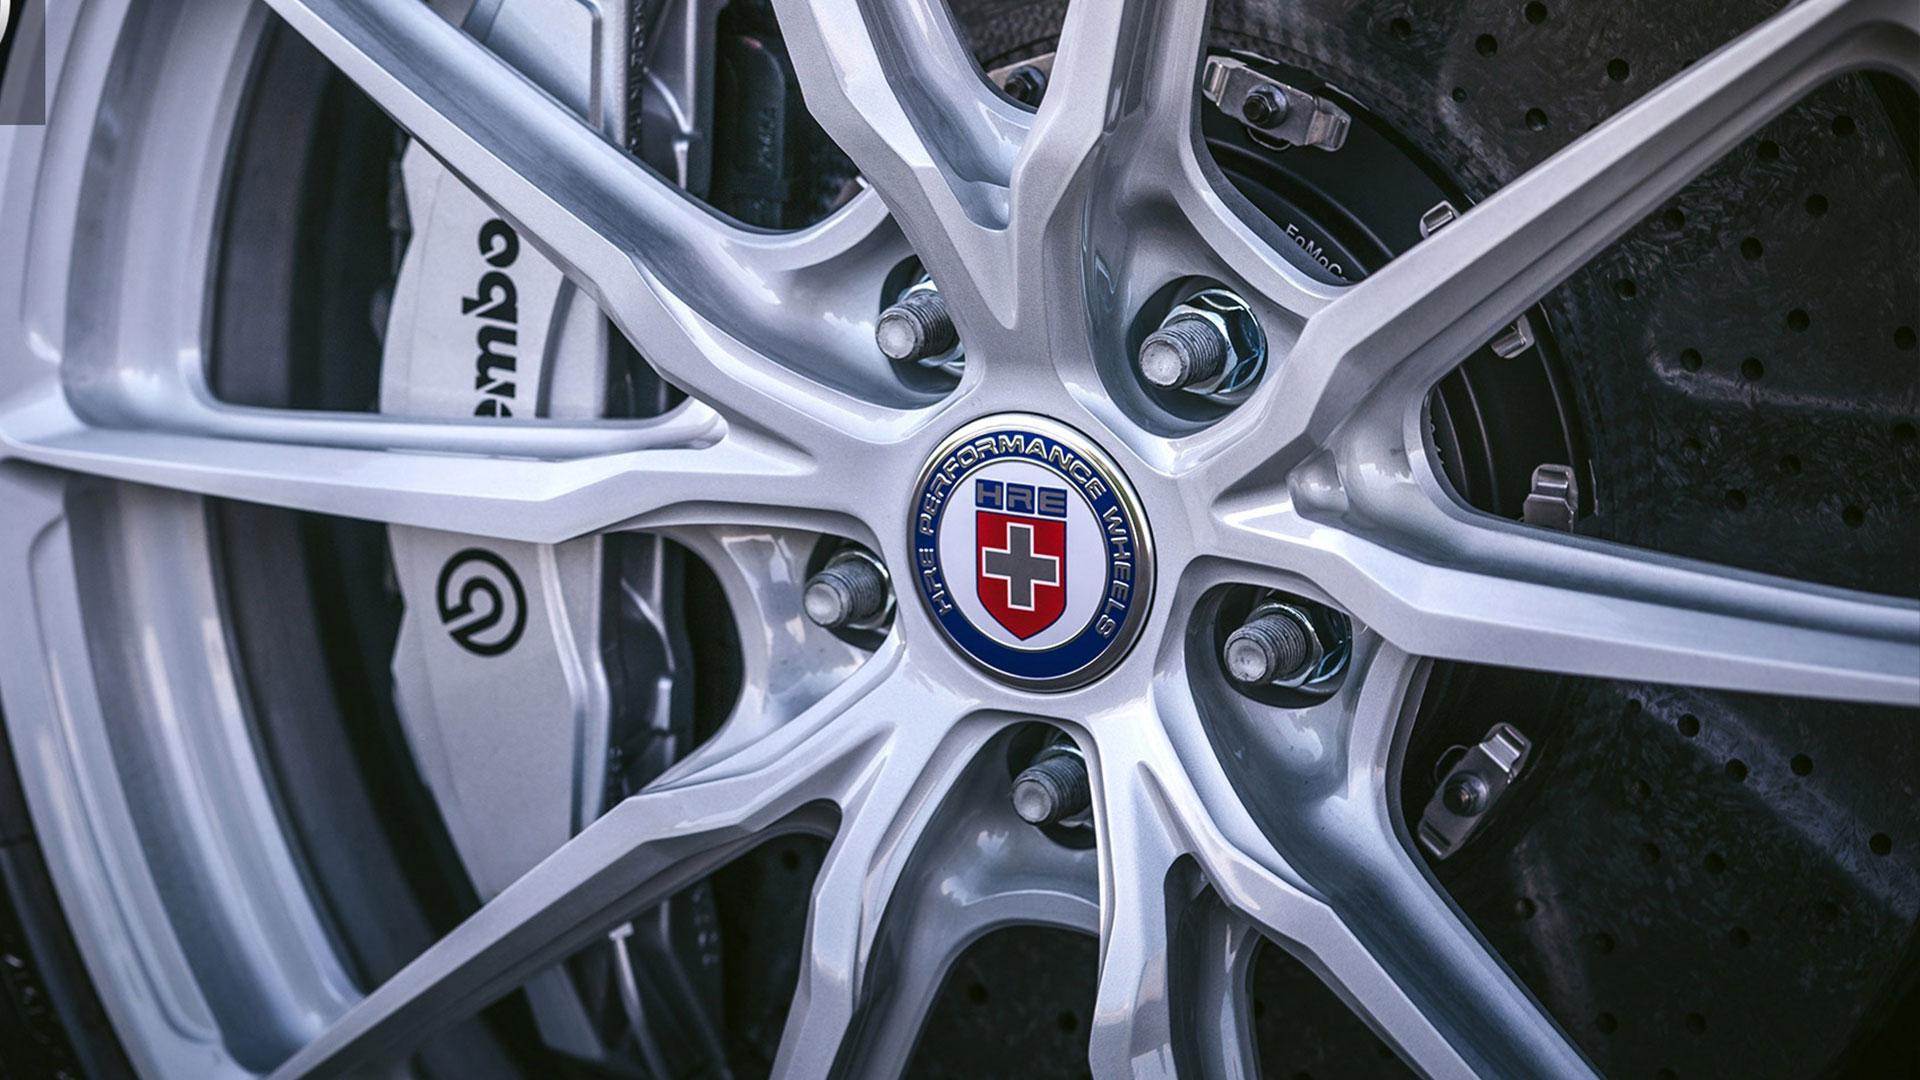 Ford GT HRE wielen Brembo remmen